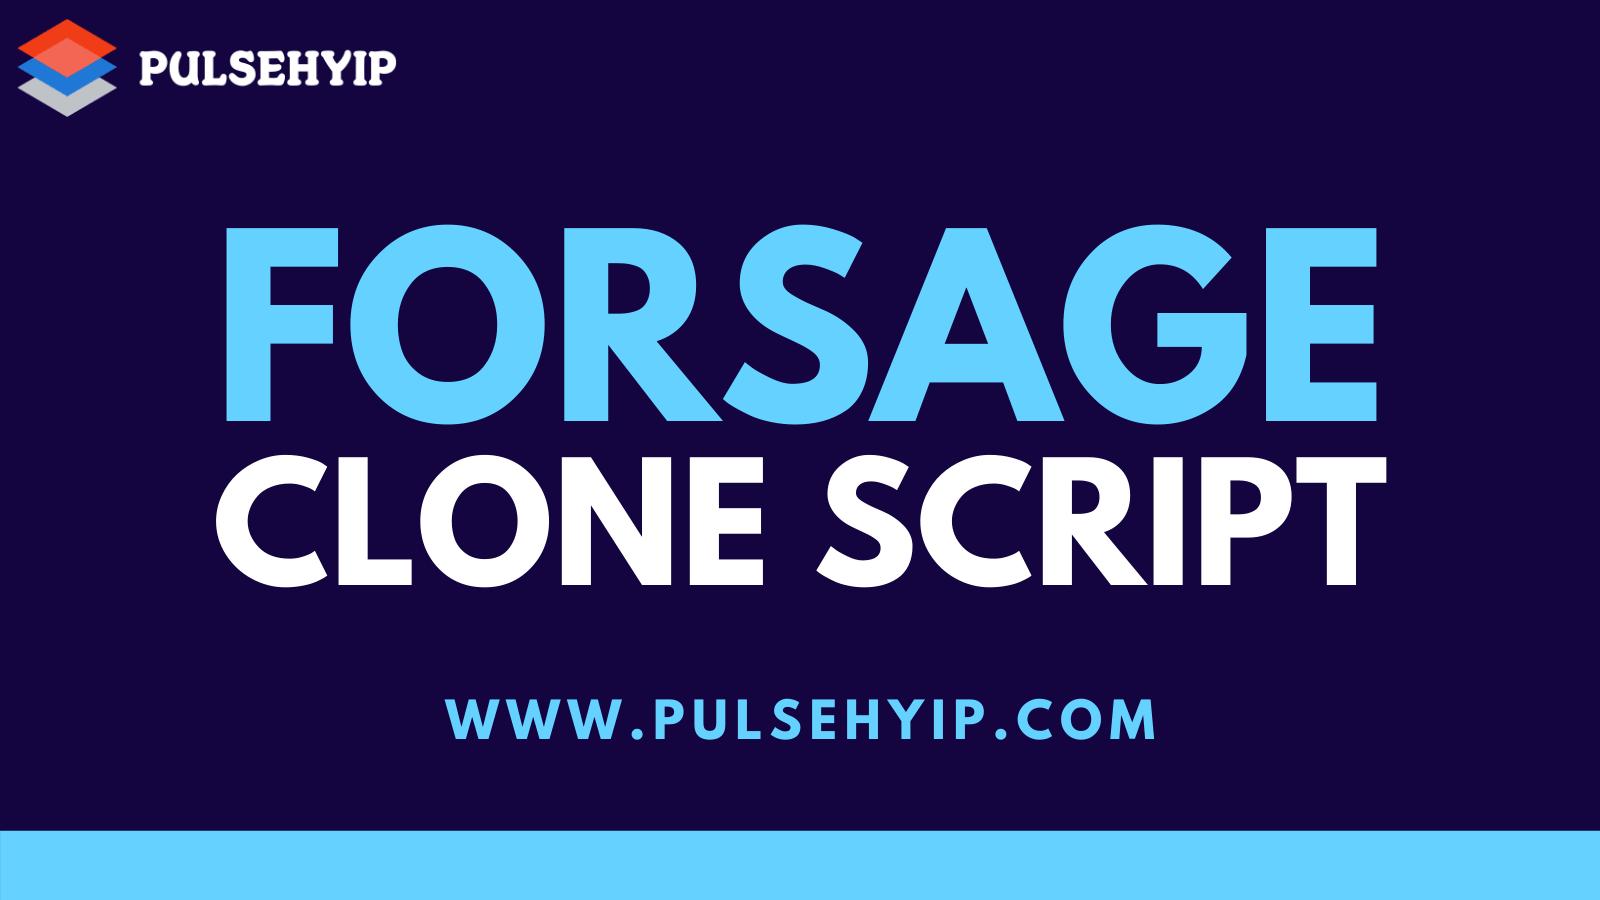 Forsage Clone Script to Start a Decentralized Ethereum Smart contract MLM platform